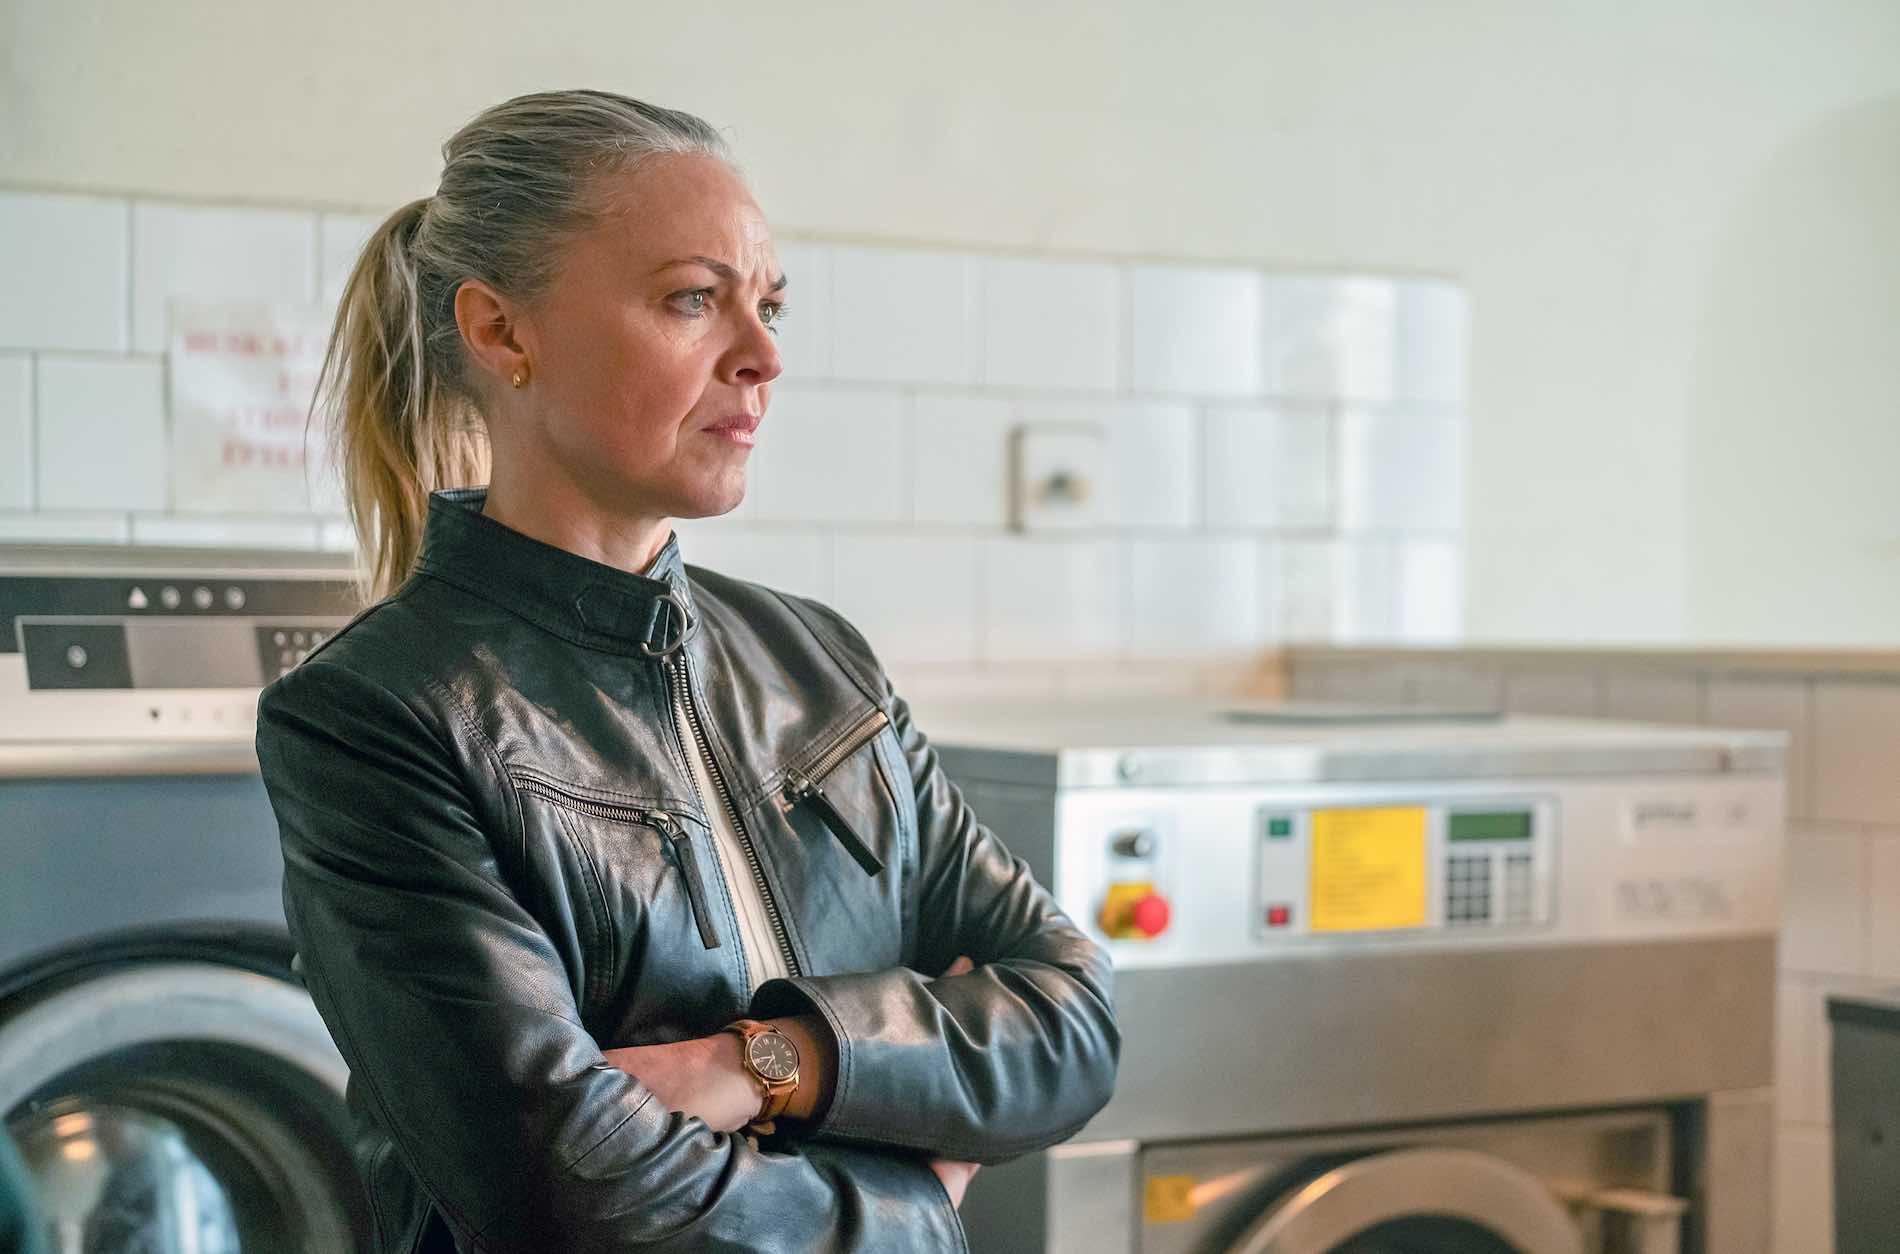 Serie aus Dänemark, Kidnapping, skandinavische Serien, Nordic Noir